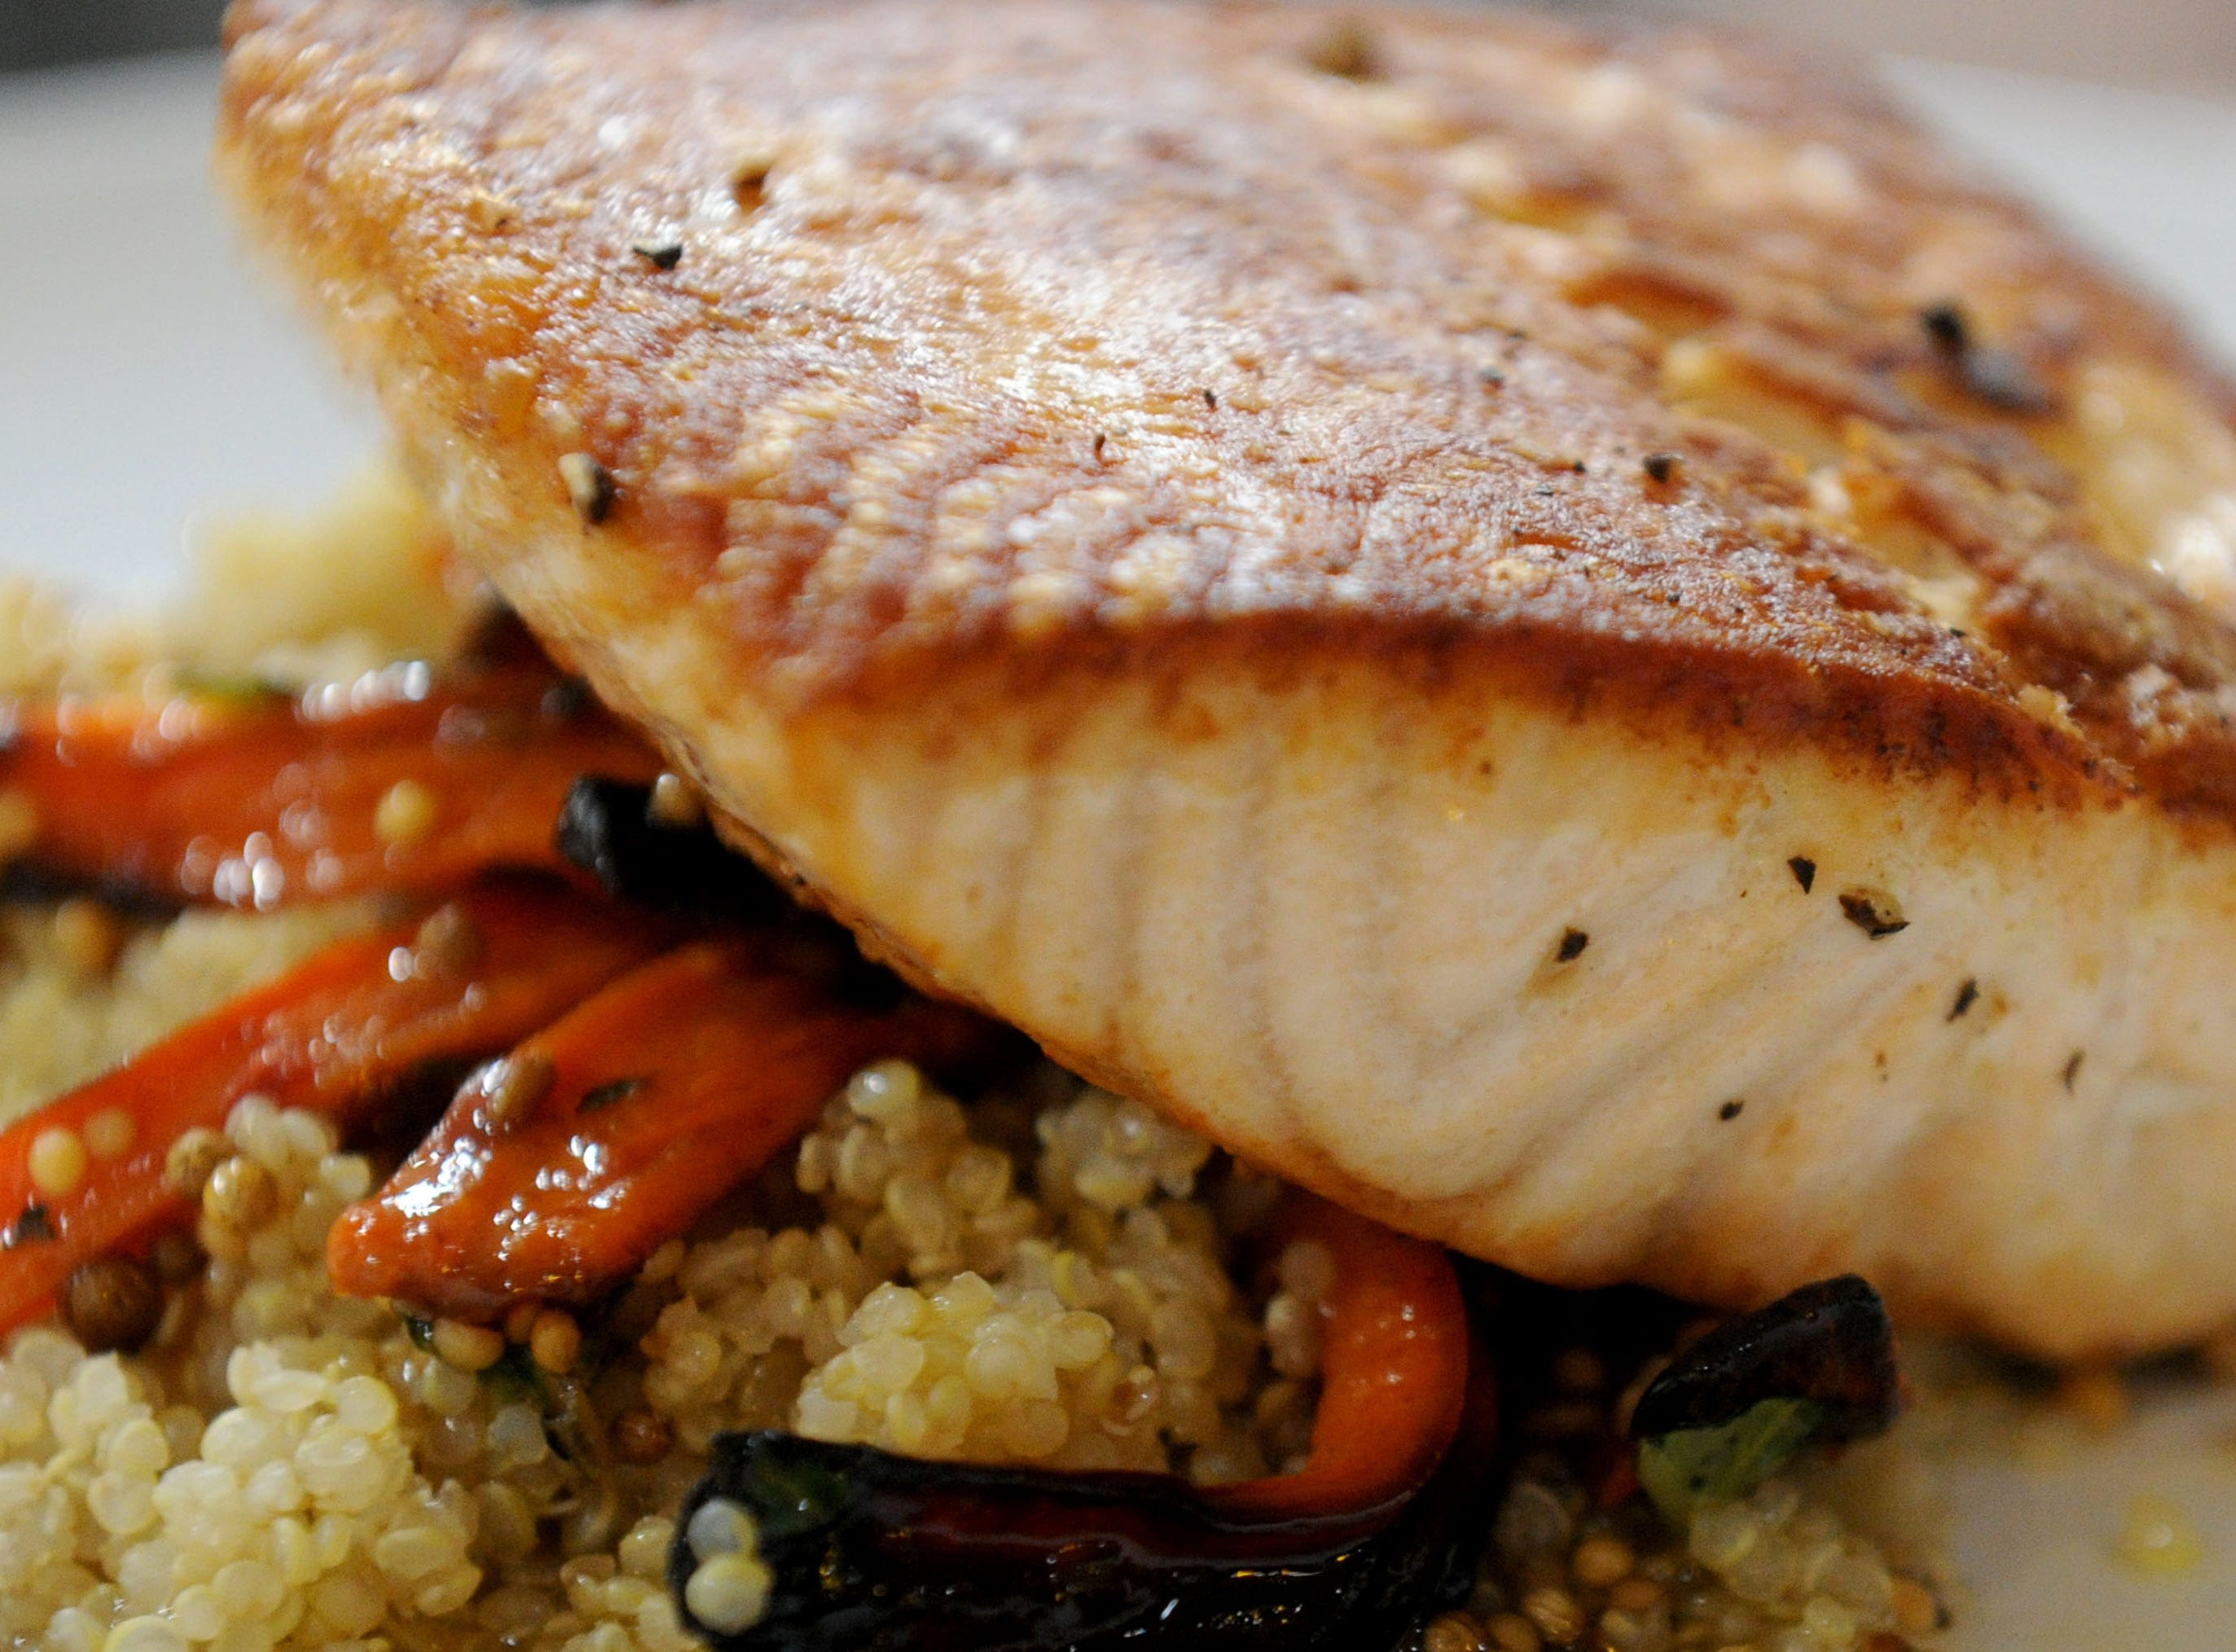 Seared Atlantic salmon is served at  Decker Kitchen in Westlake Village.